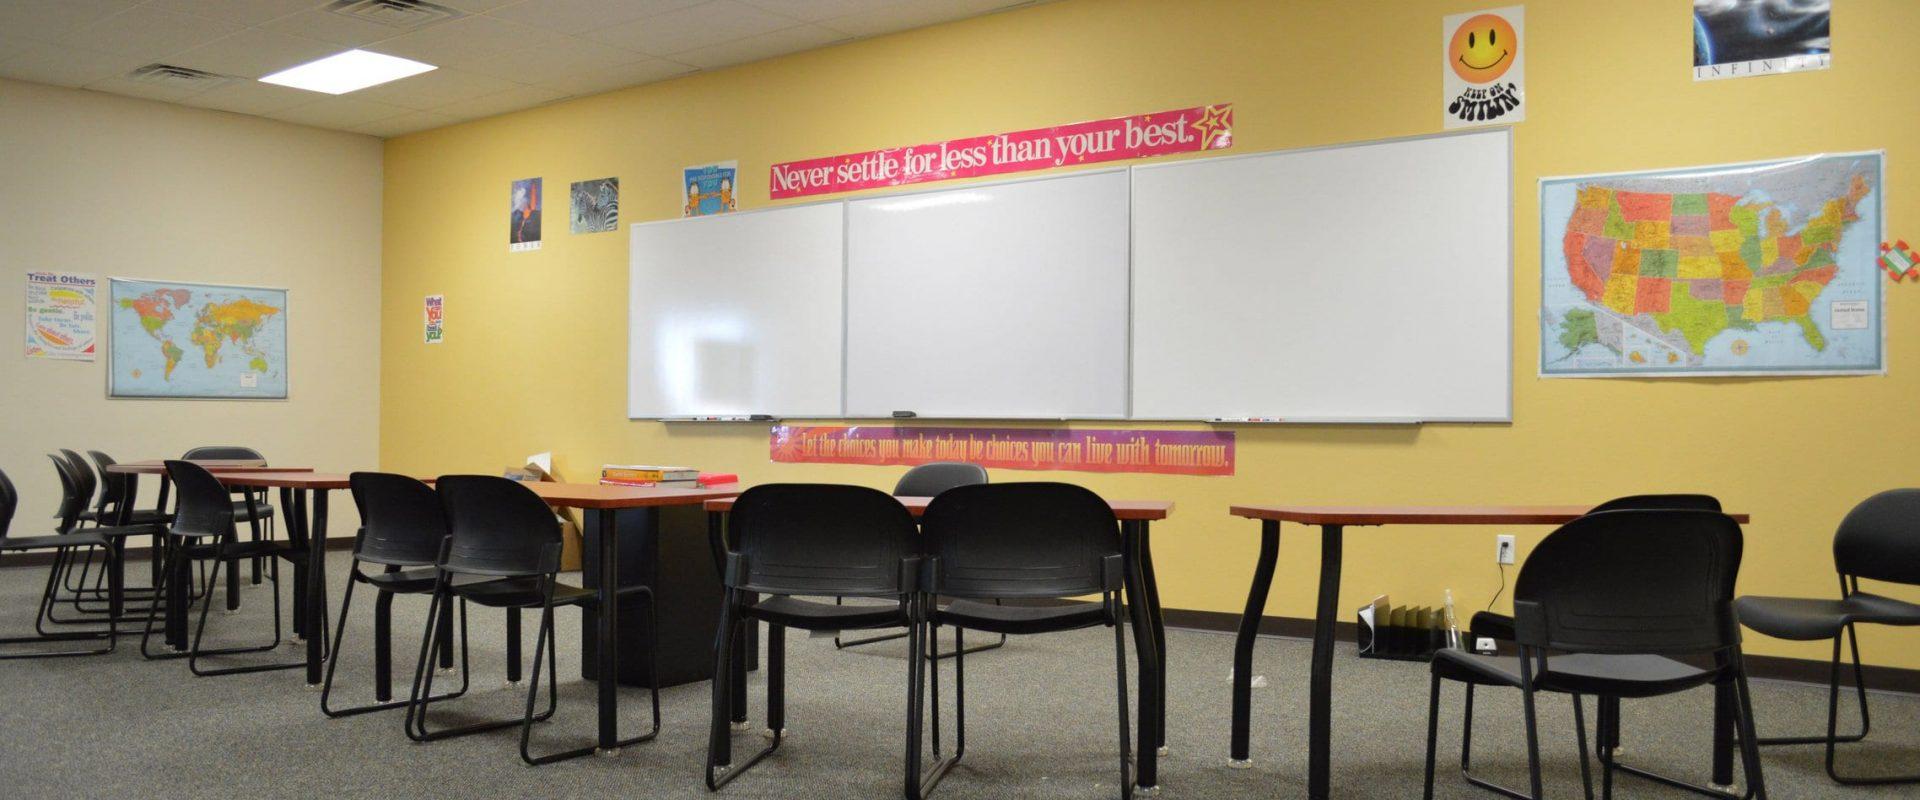 Ombudsman Alternative Learning Center - CCSD